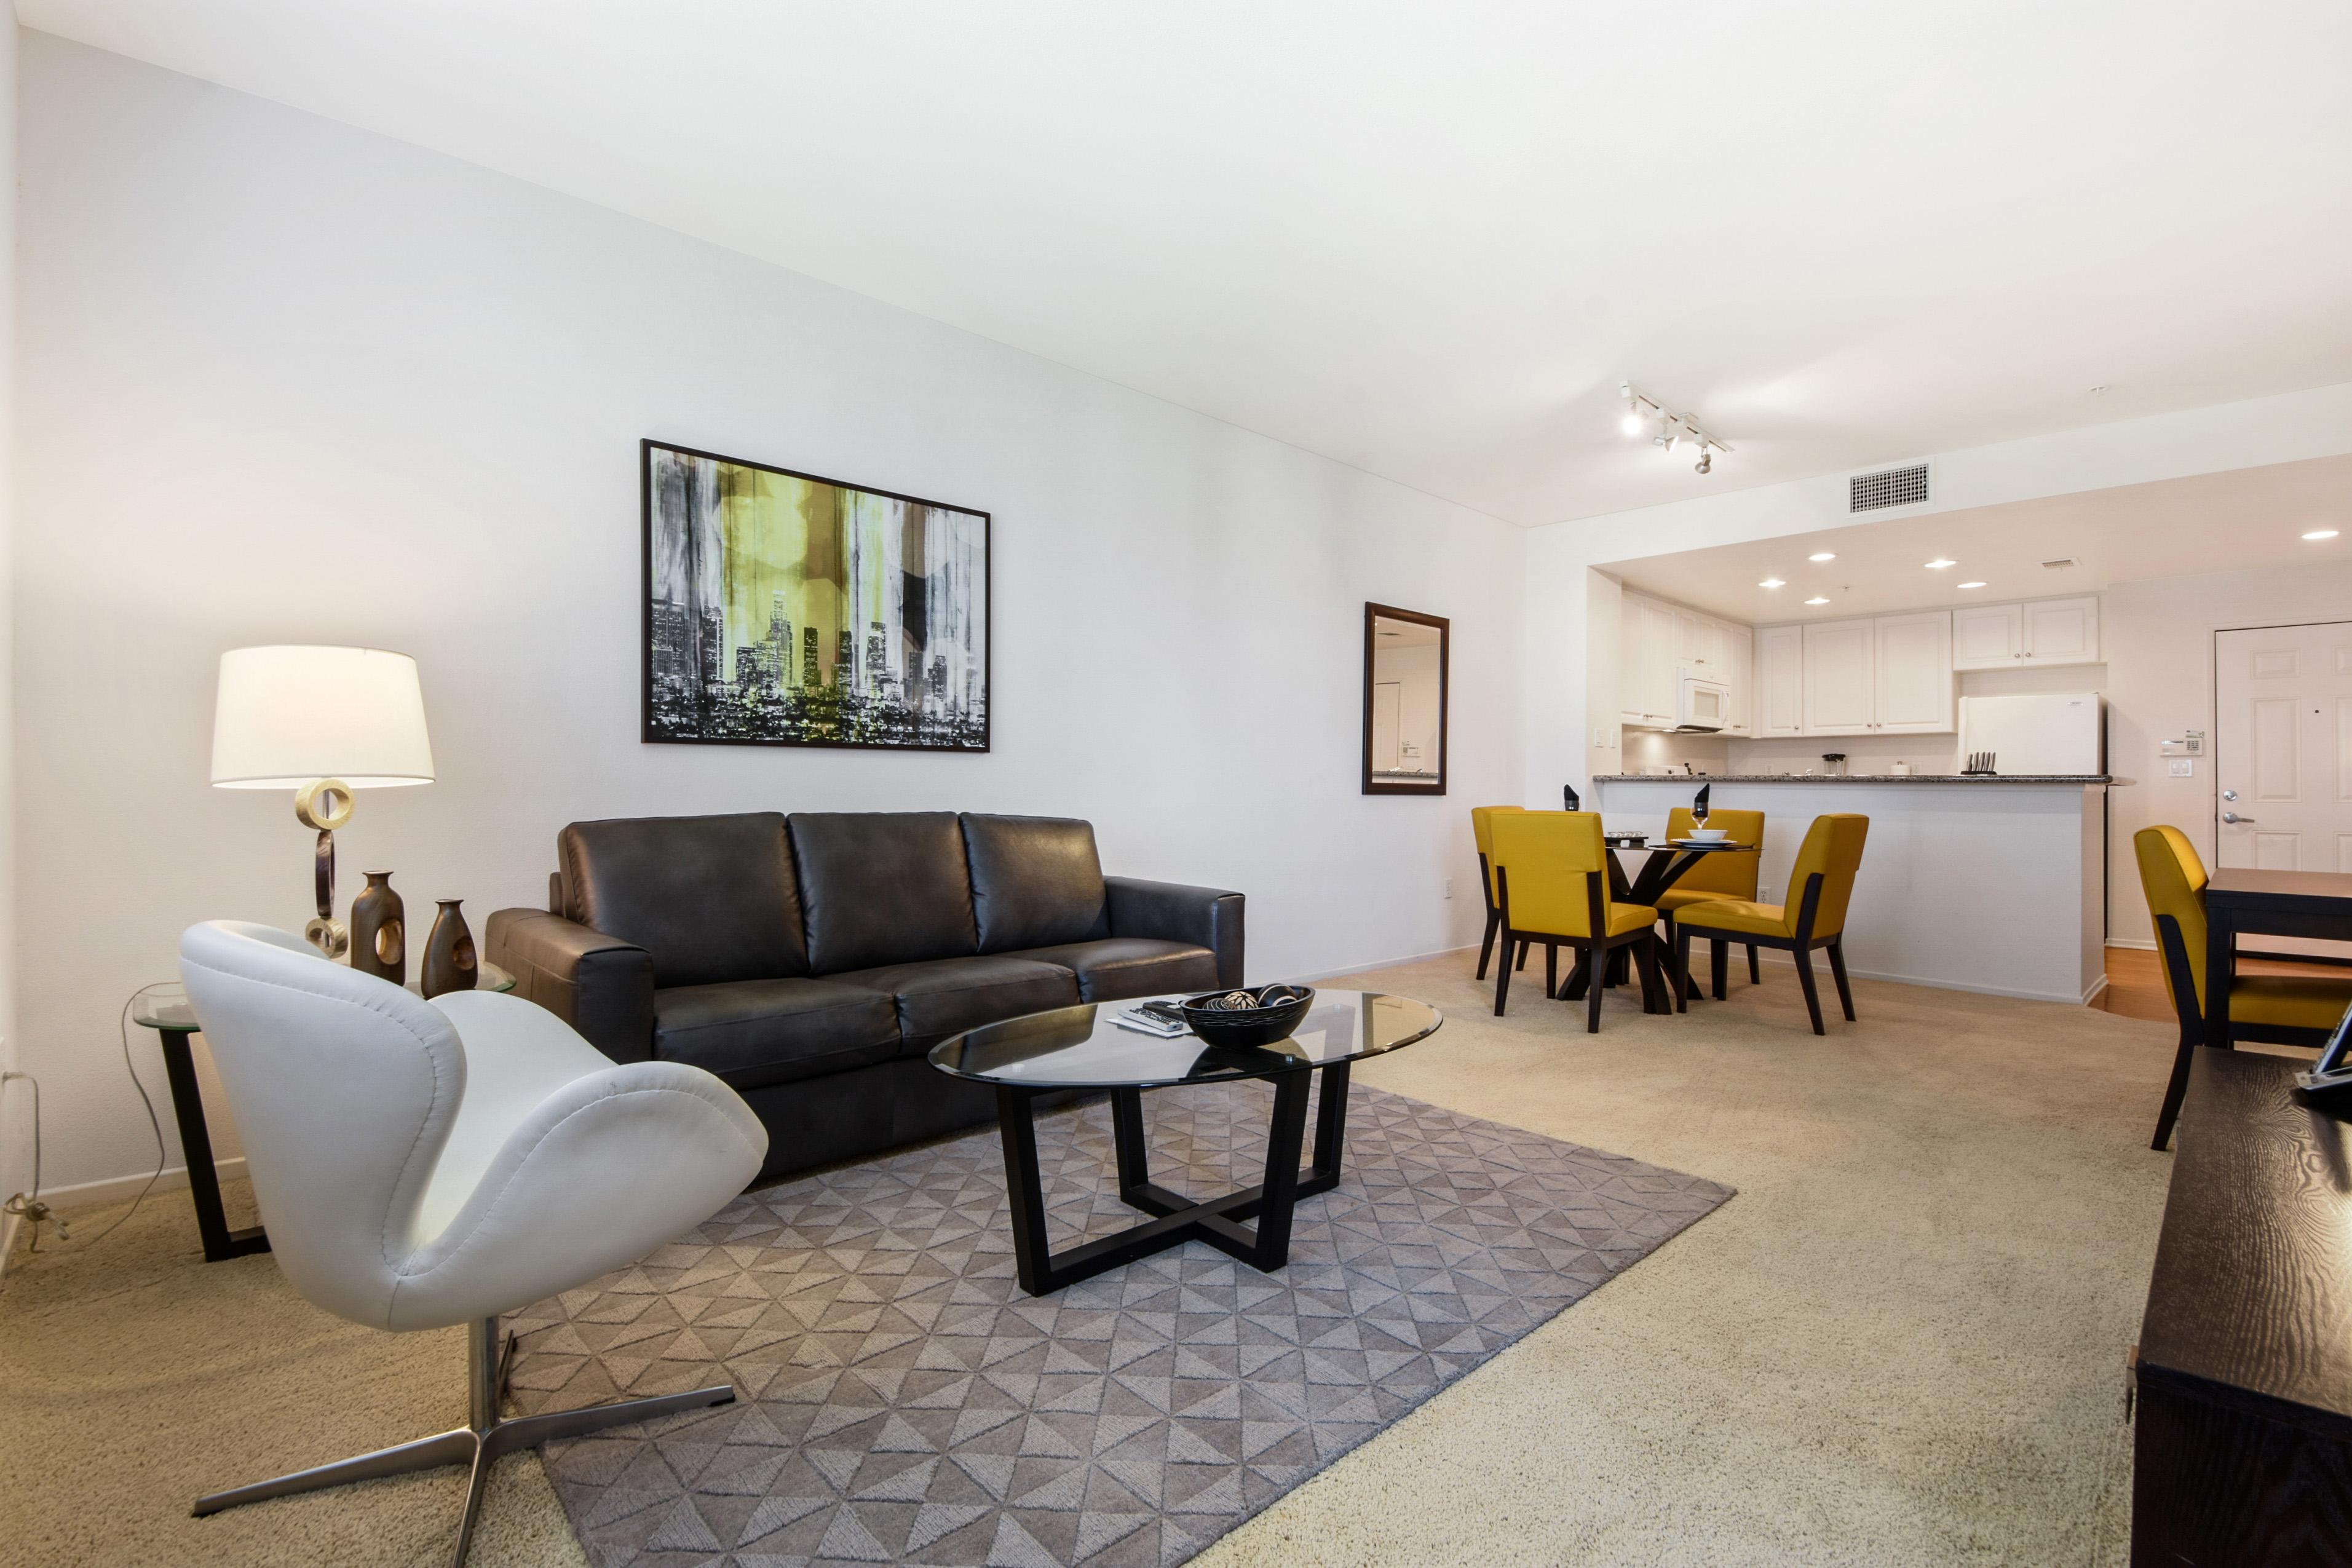 image 2 furnished 1 bedroom Apartment for rent in Irvine, Orange County